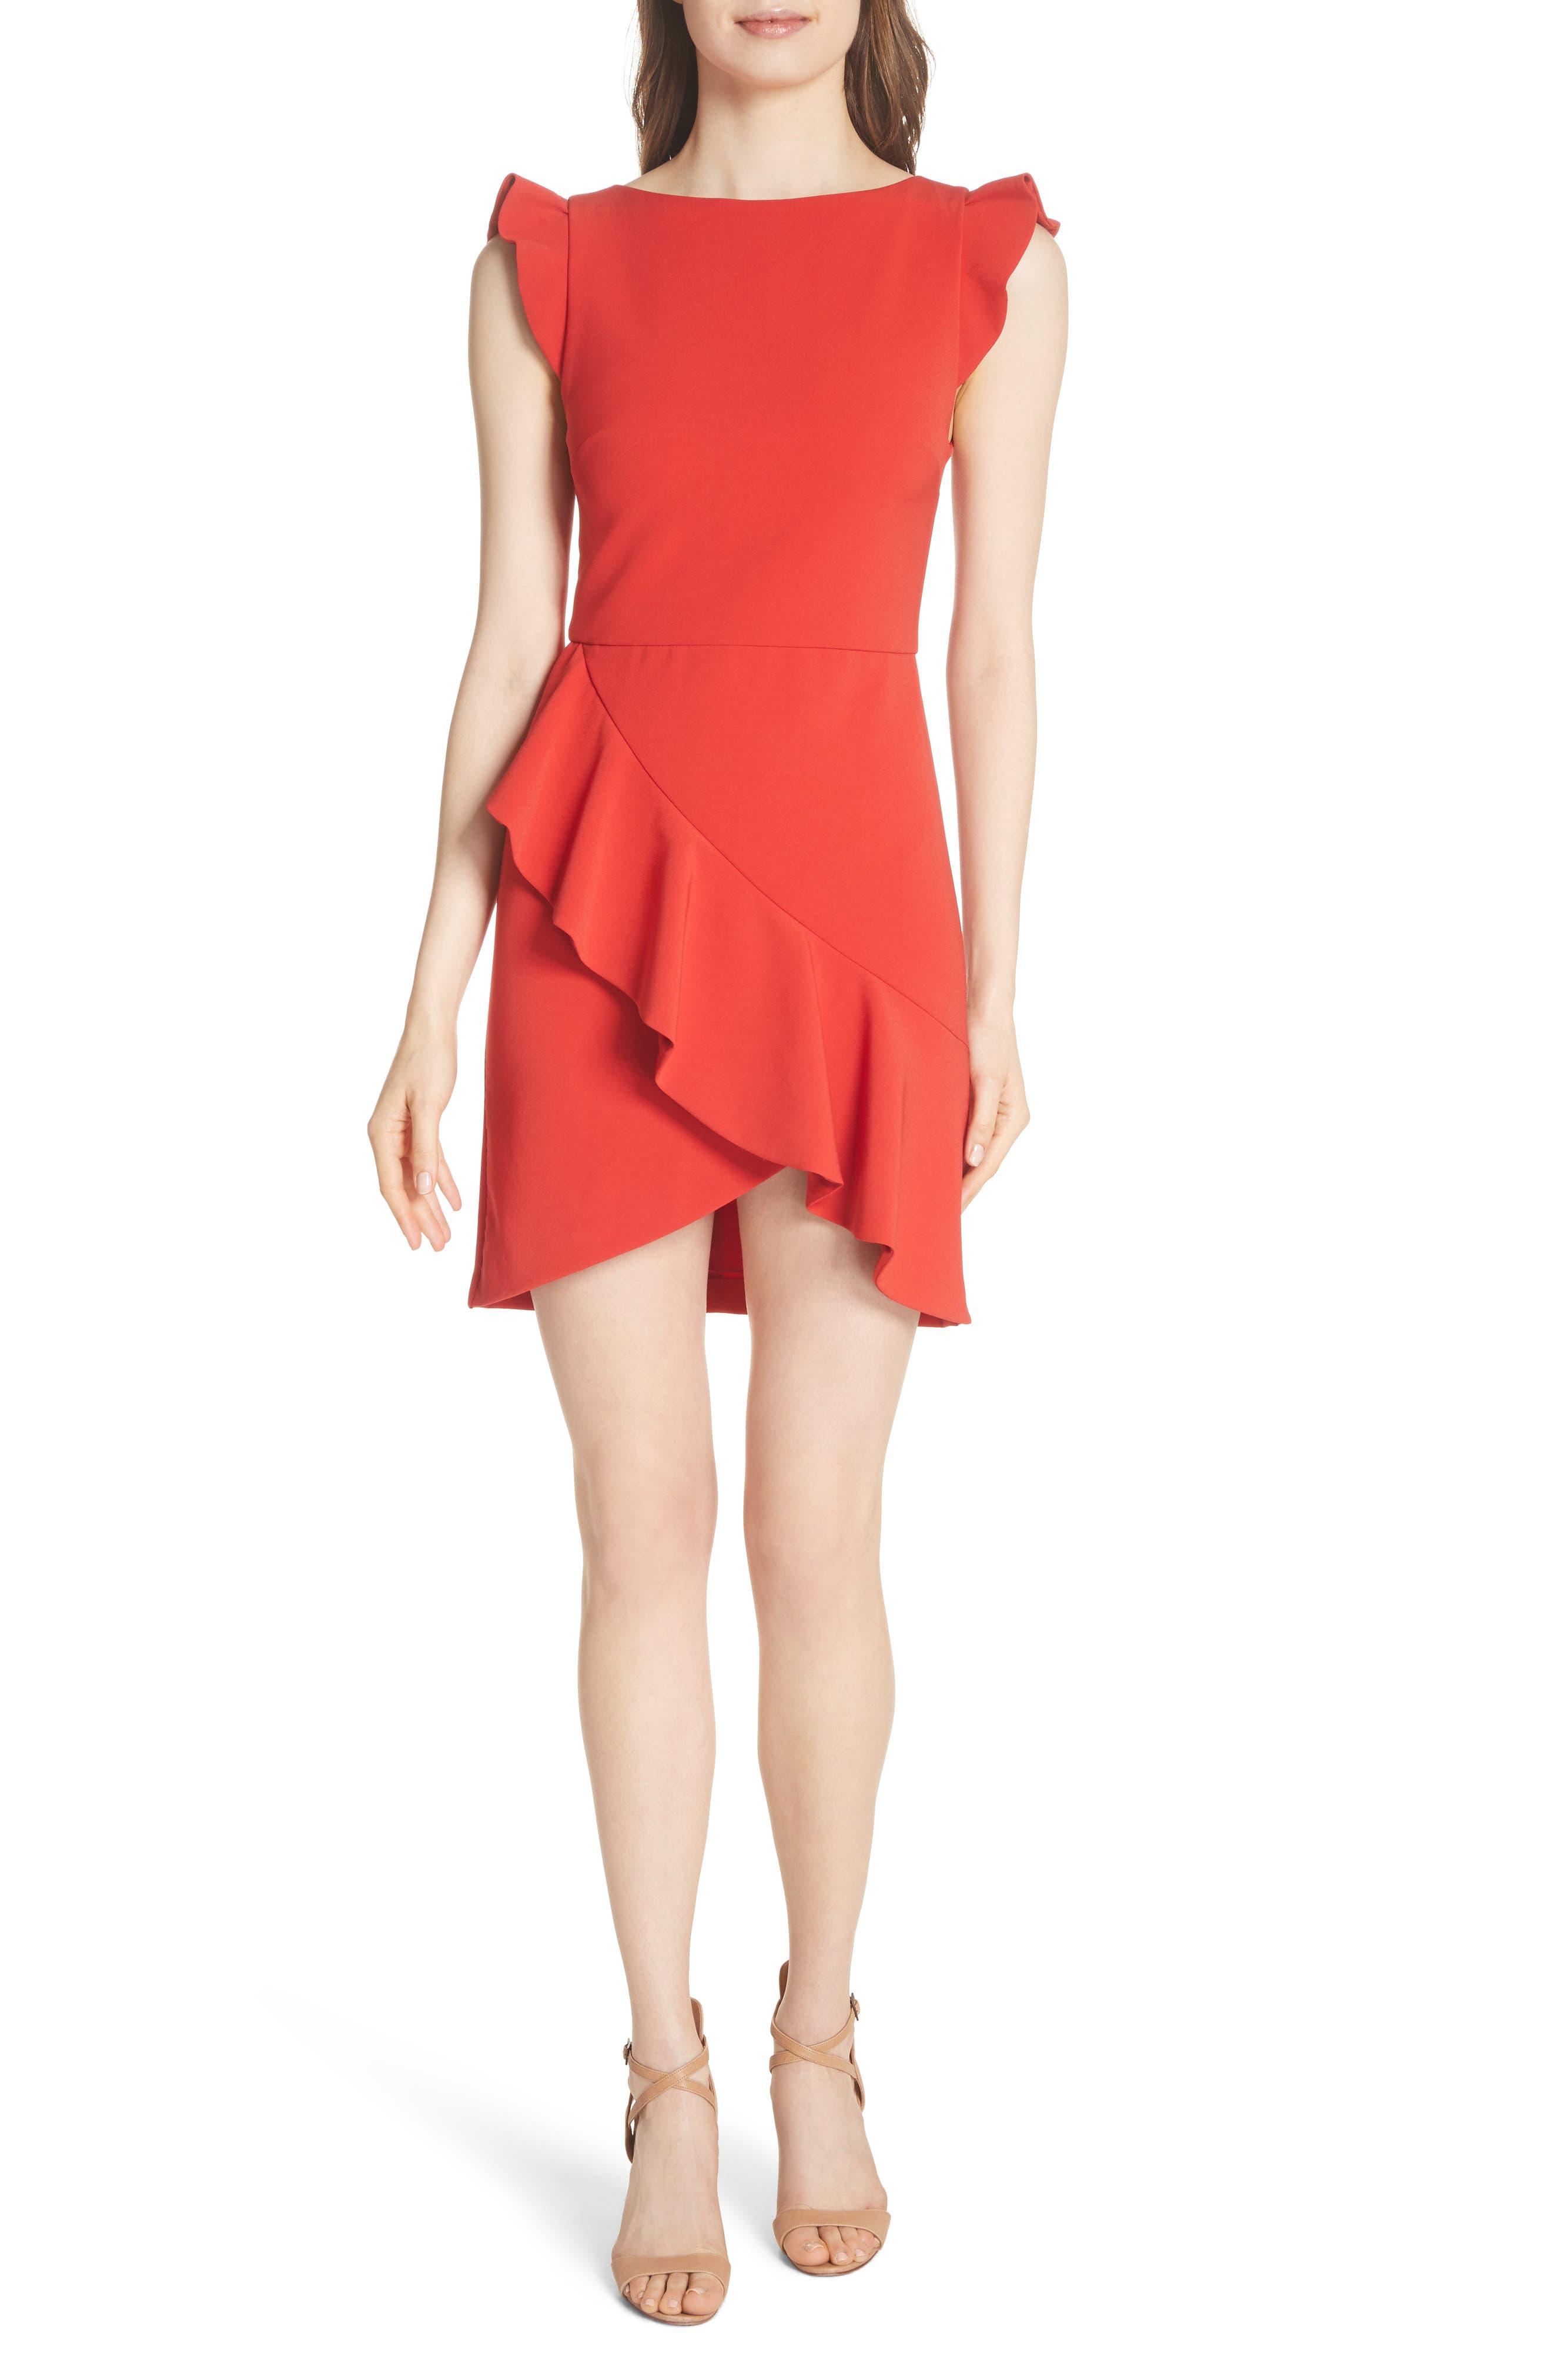 Alternate Image 1 Selected - Alice + Olivia Verona Ruffled Minidress